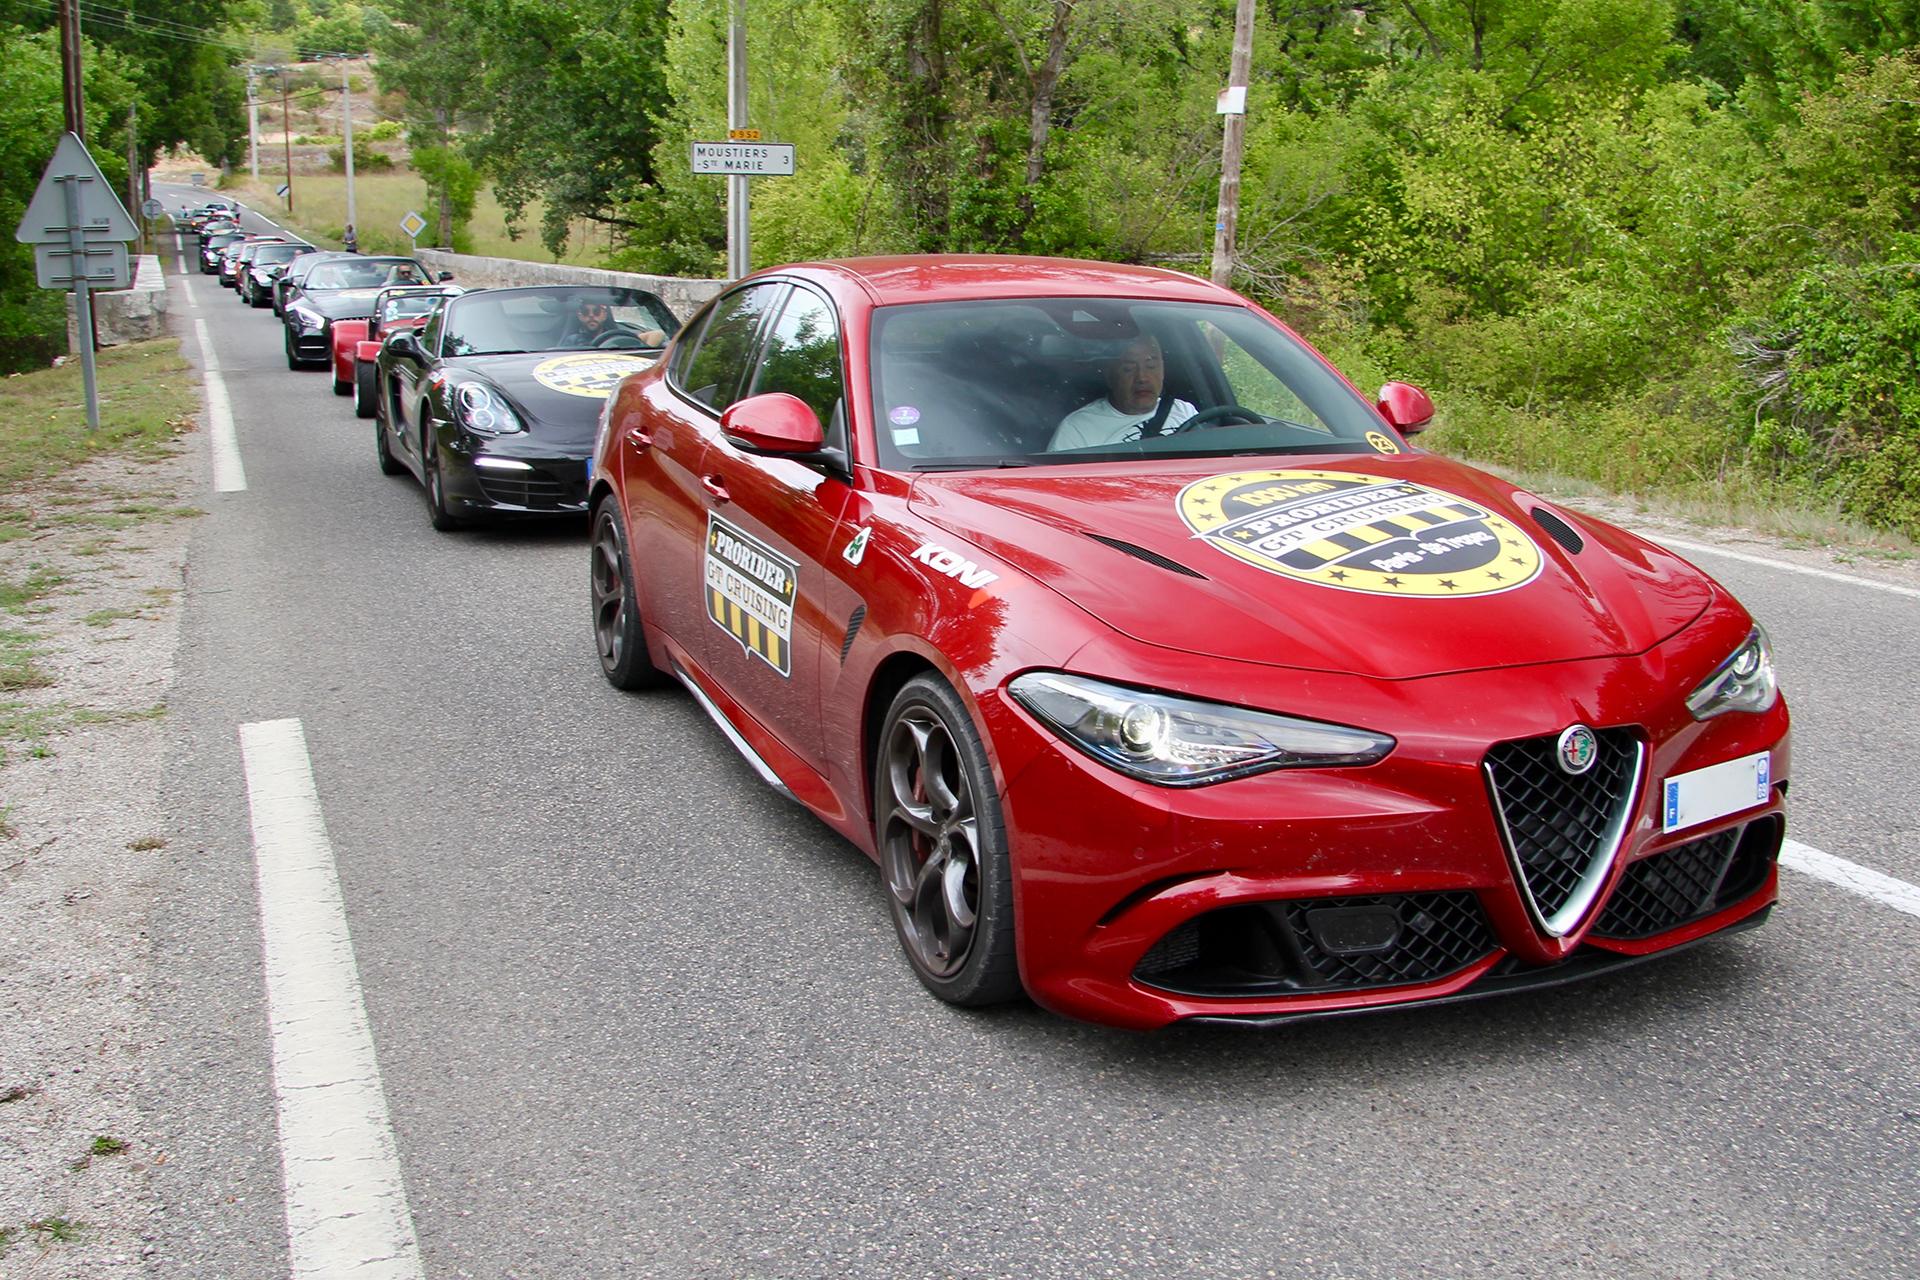 Alfa Romeo Giulia Quadrifoglio - sur la Route des Gorges du Verdon - Prorider GT Cruising - 2019 - photo Ludo Ferrari